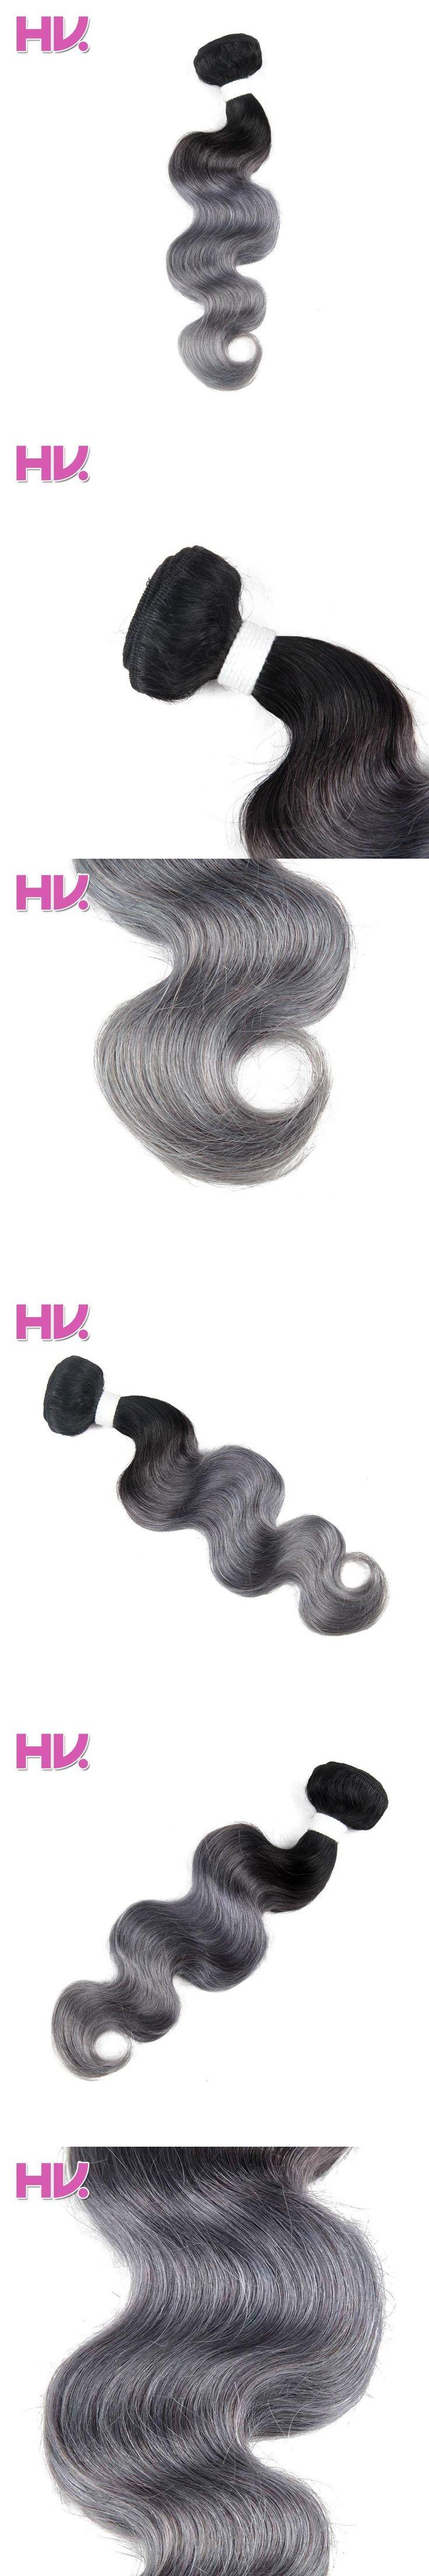 Hair Villa Pre-colored Human Hair Weave Brazilian Body Wave Hair Extensions 1B/gray 10-18 inch Non-Remy Hair Bundles